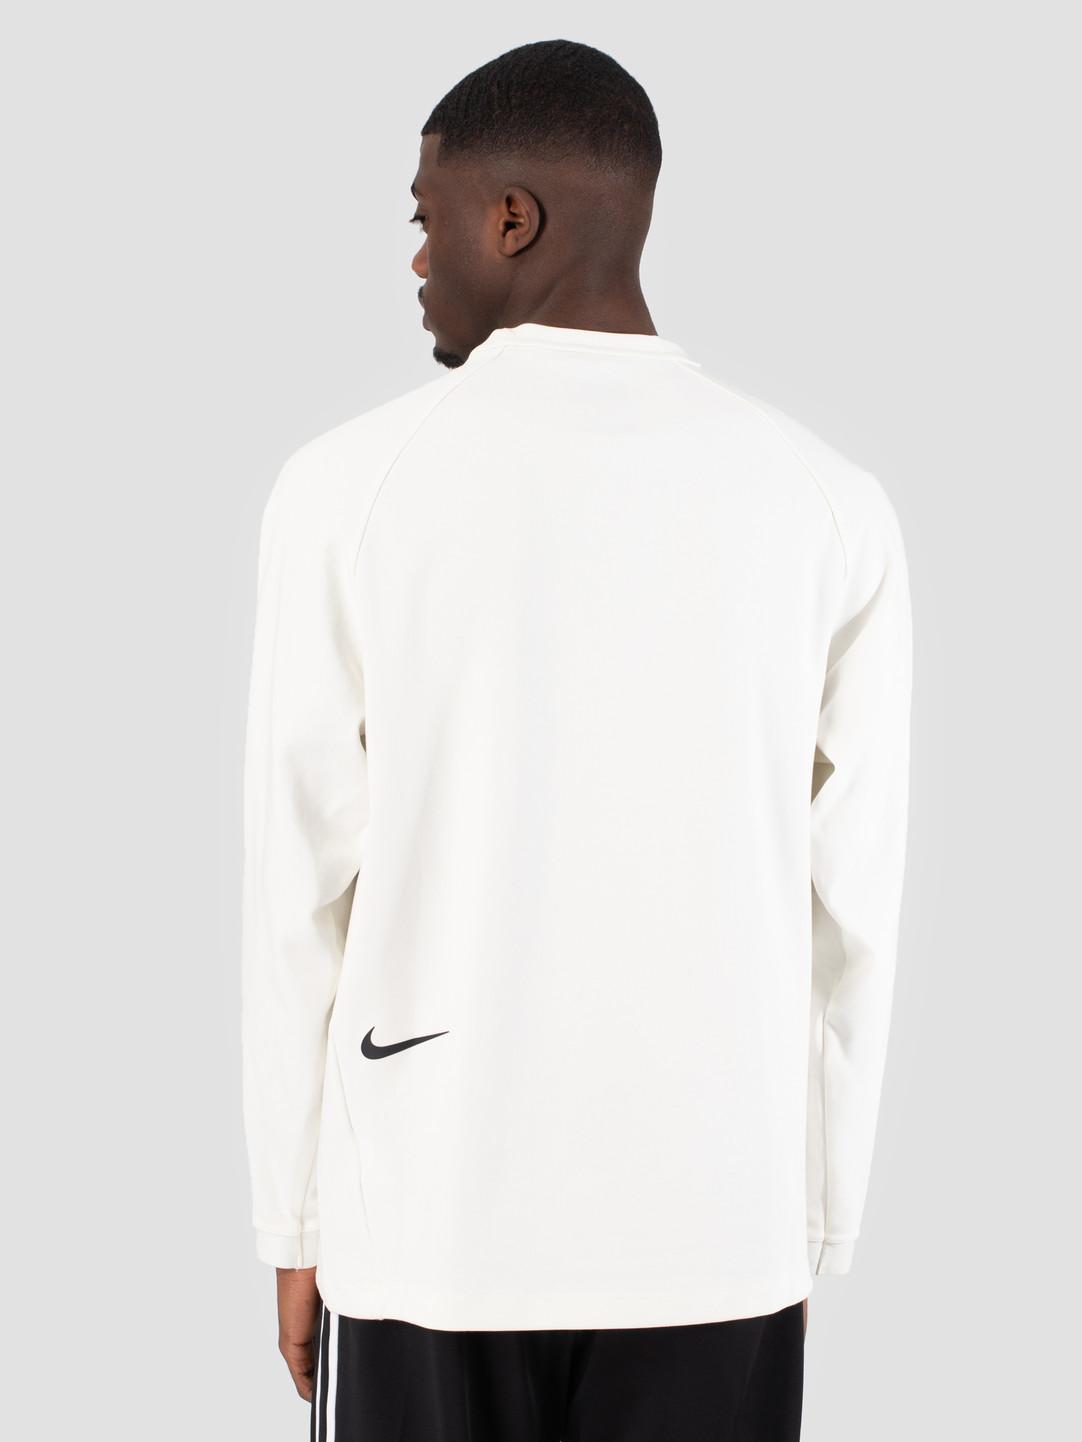 Nike Nike Sportswear Tech Pack Sweat Sail Light Bone Black Ar1556-133